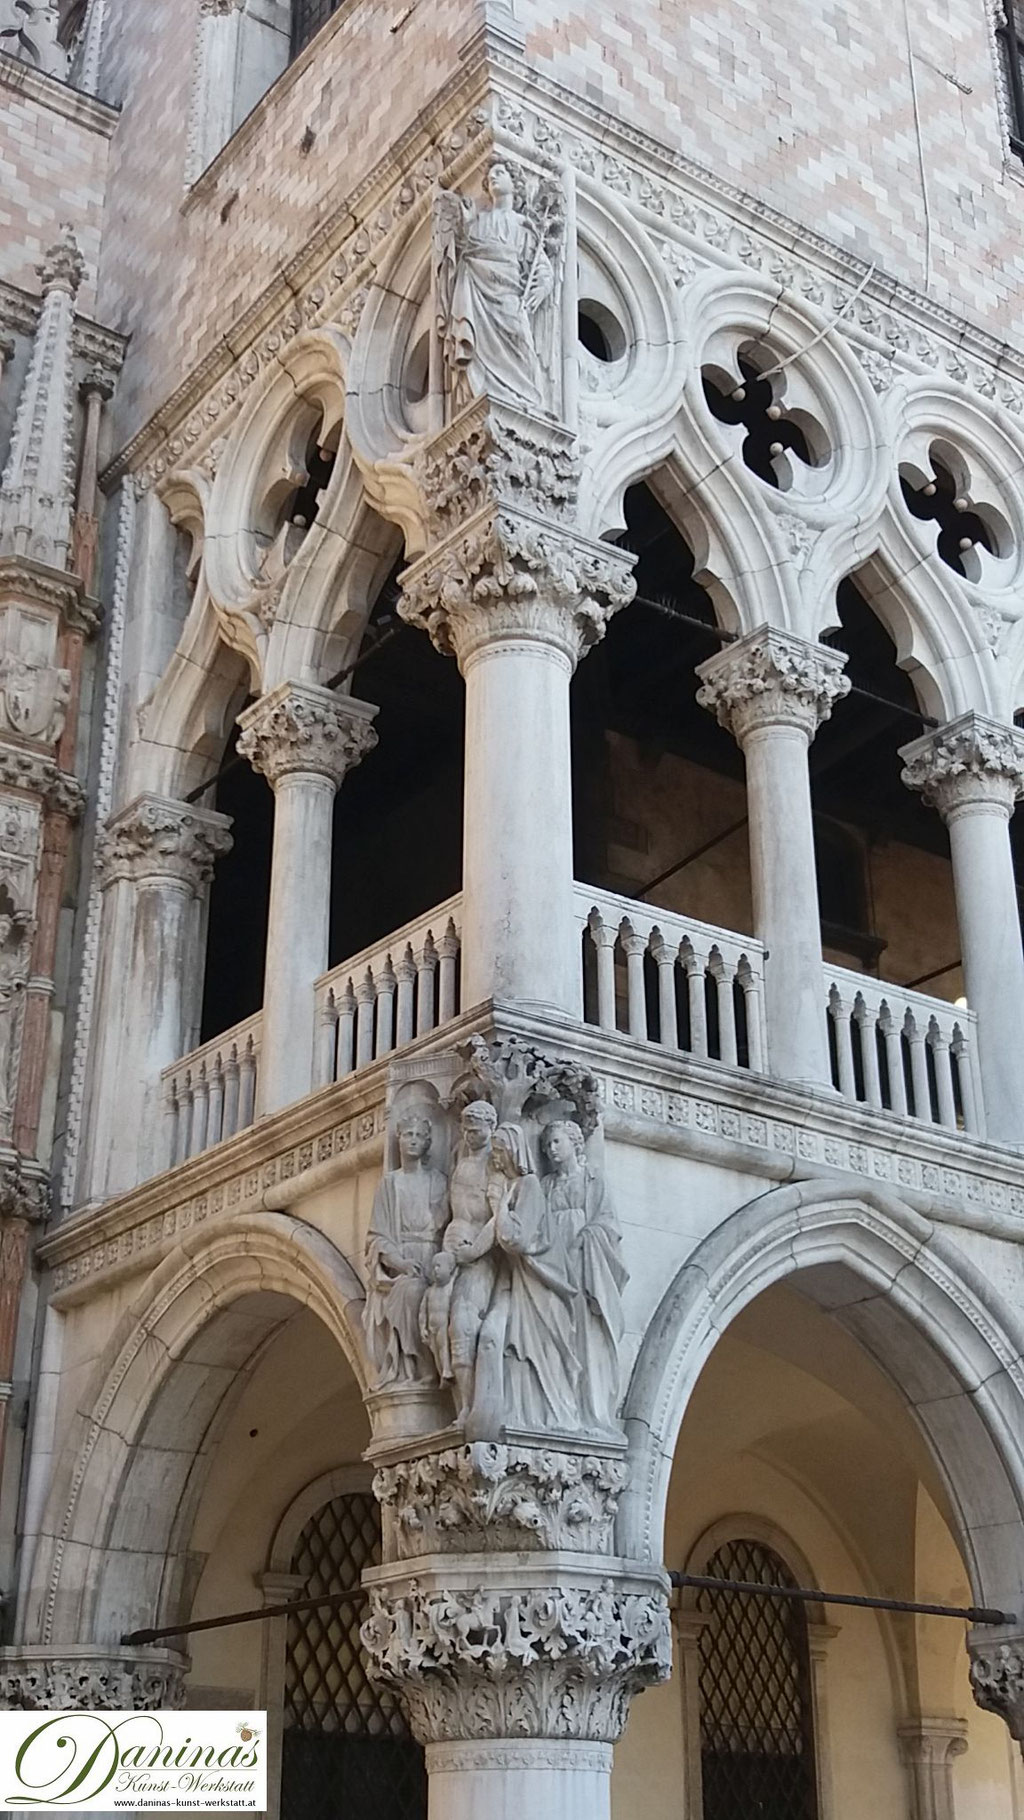 Venedig San Marco Dogenpalast